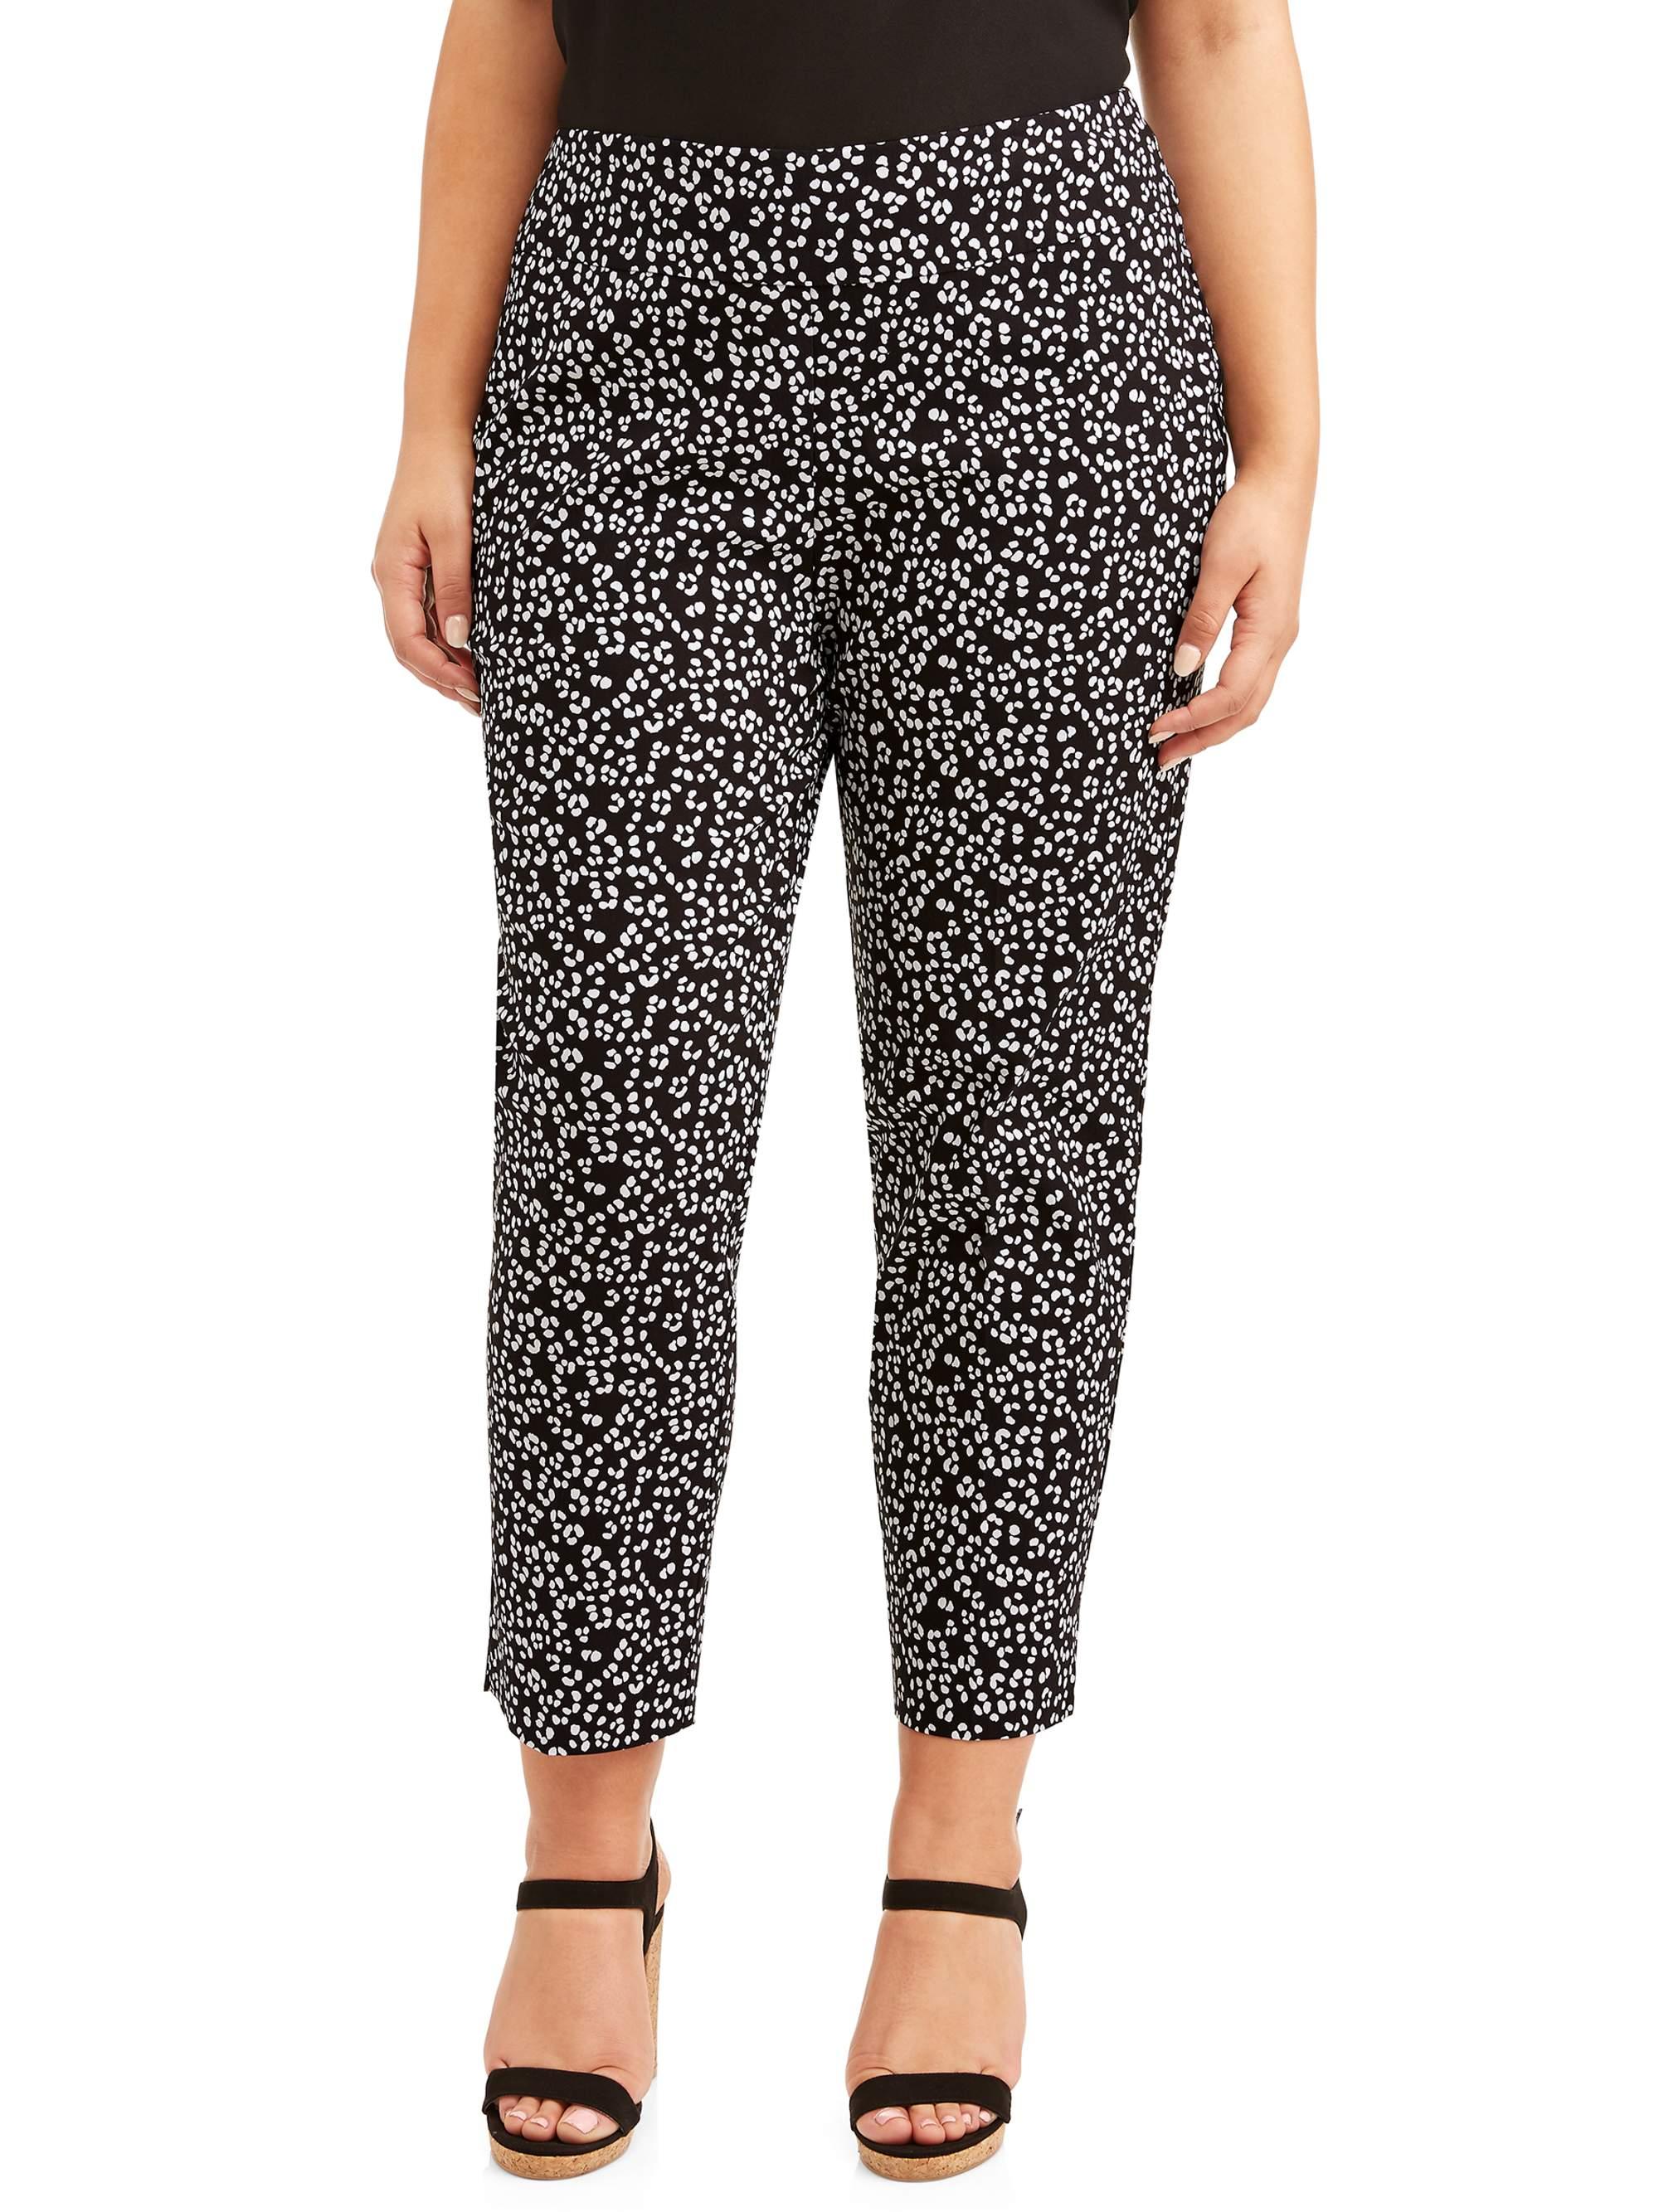 Women's Plus Size Pull On Black White Dot Pant